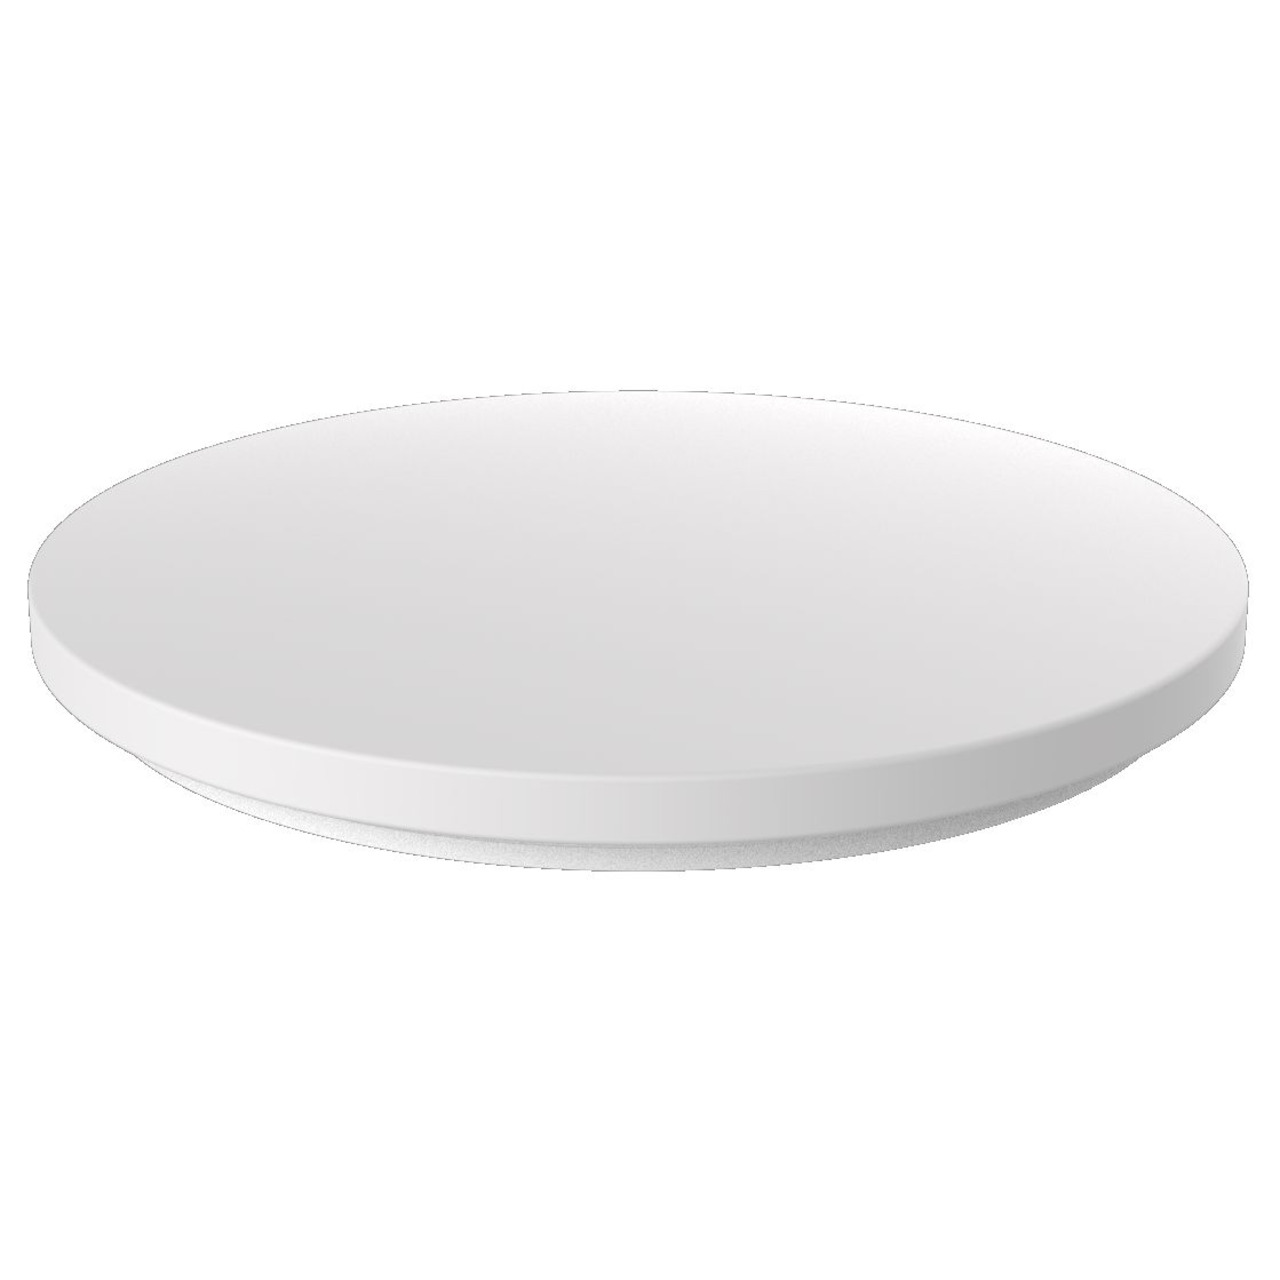 Blulaxa 24-W-LED-Wand-Deckenleuchte Aina-L mit Dimmfunktion- 2000 lm- warmweiss (3000 K)